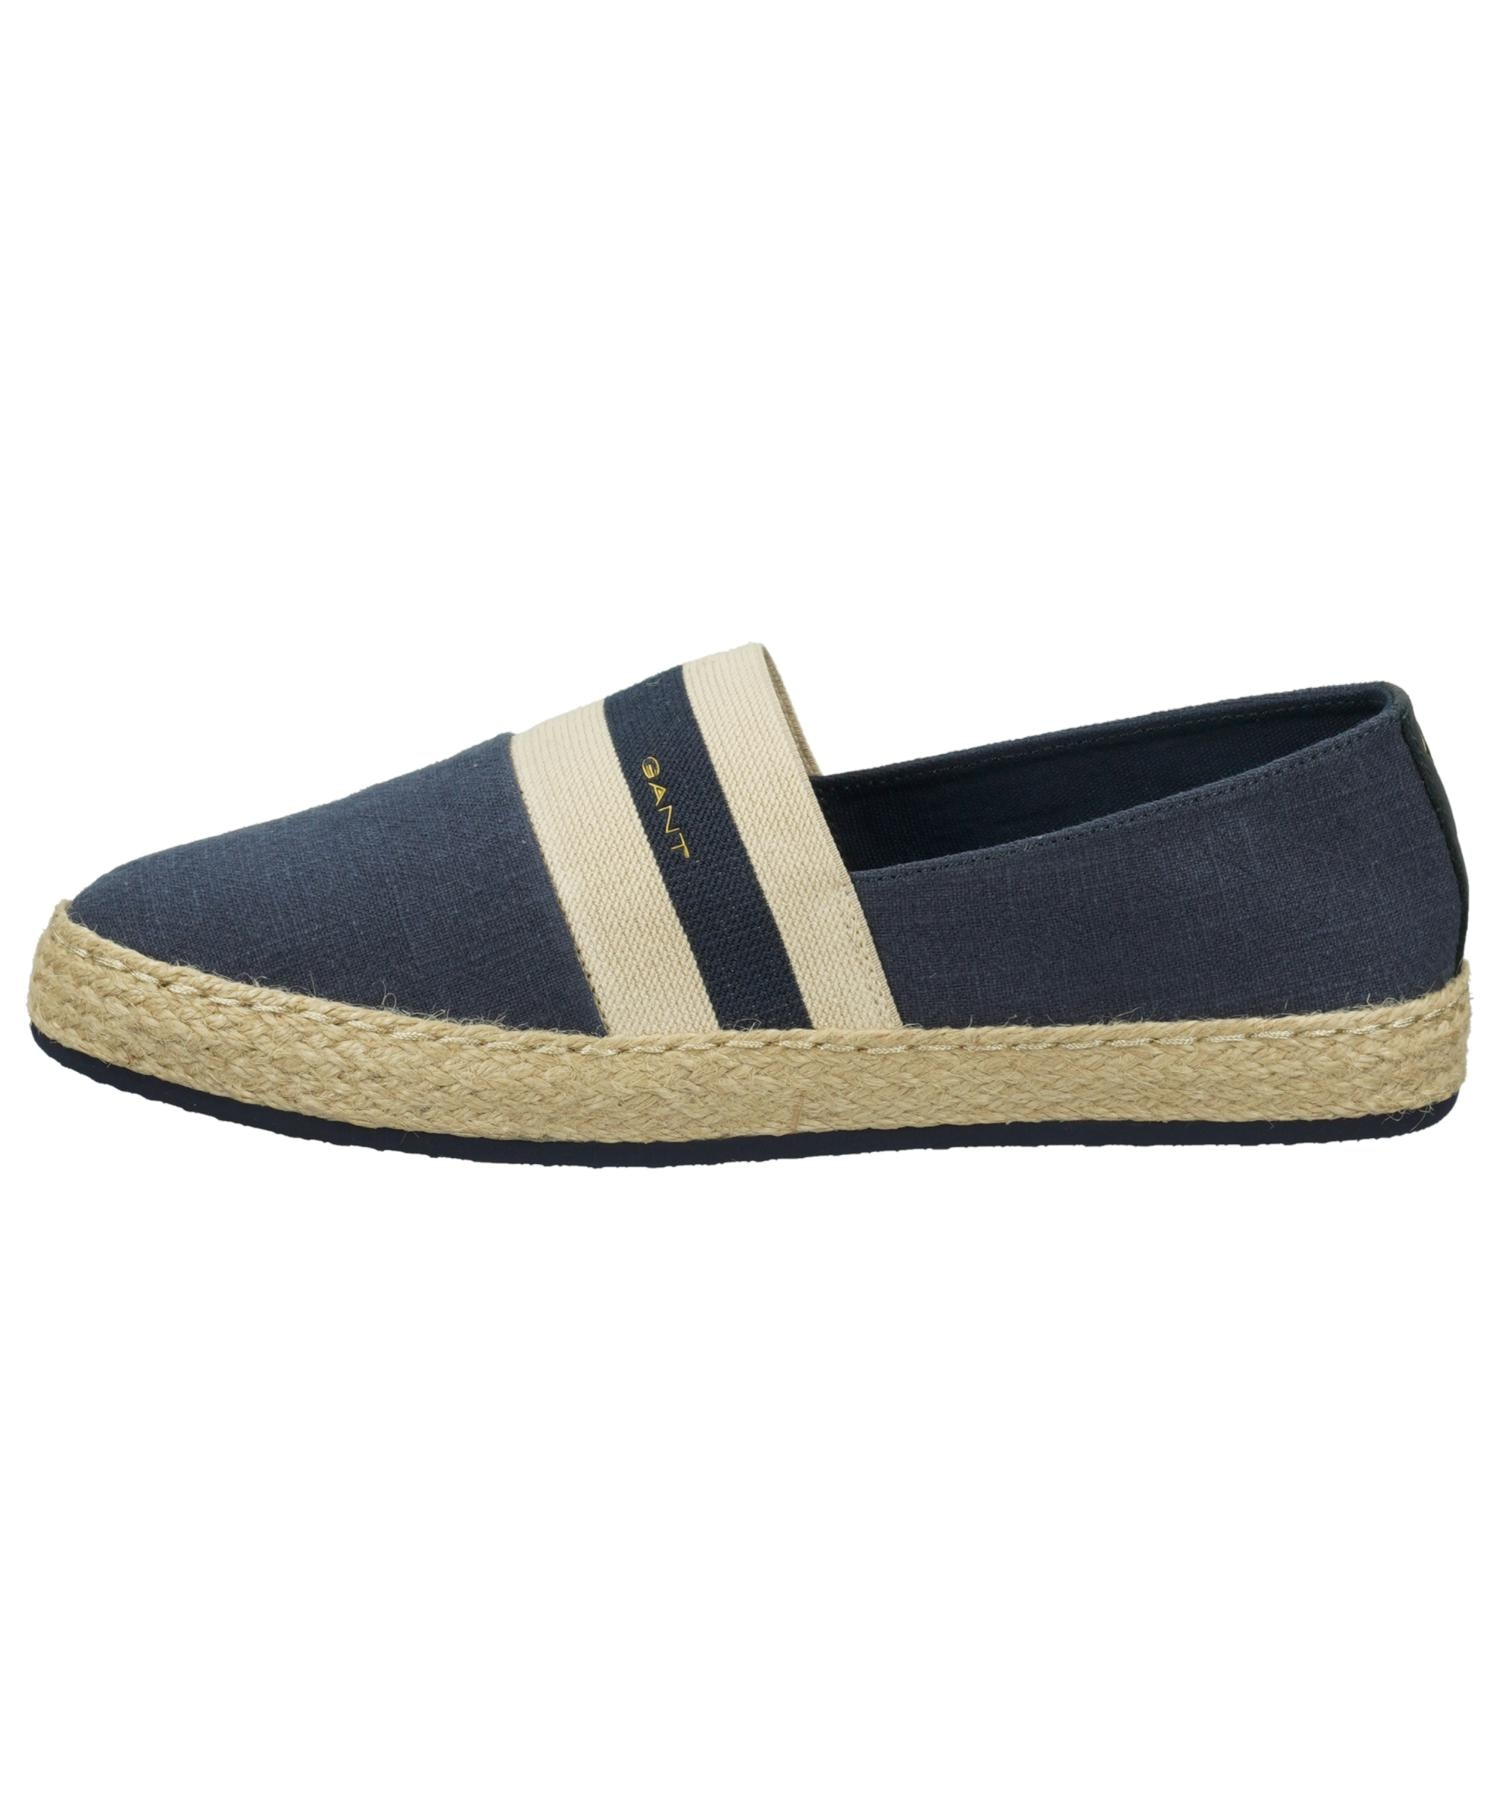 Gant Raffiaville sko